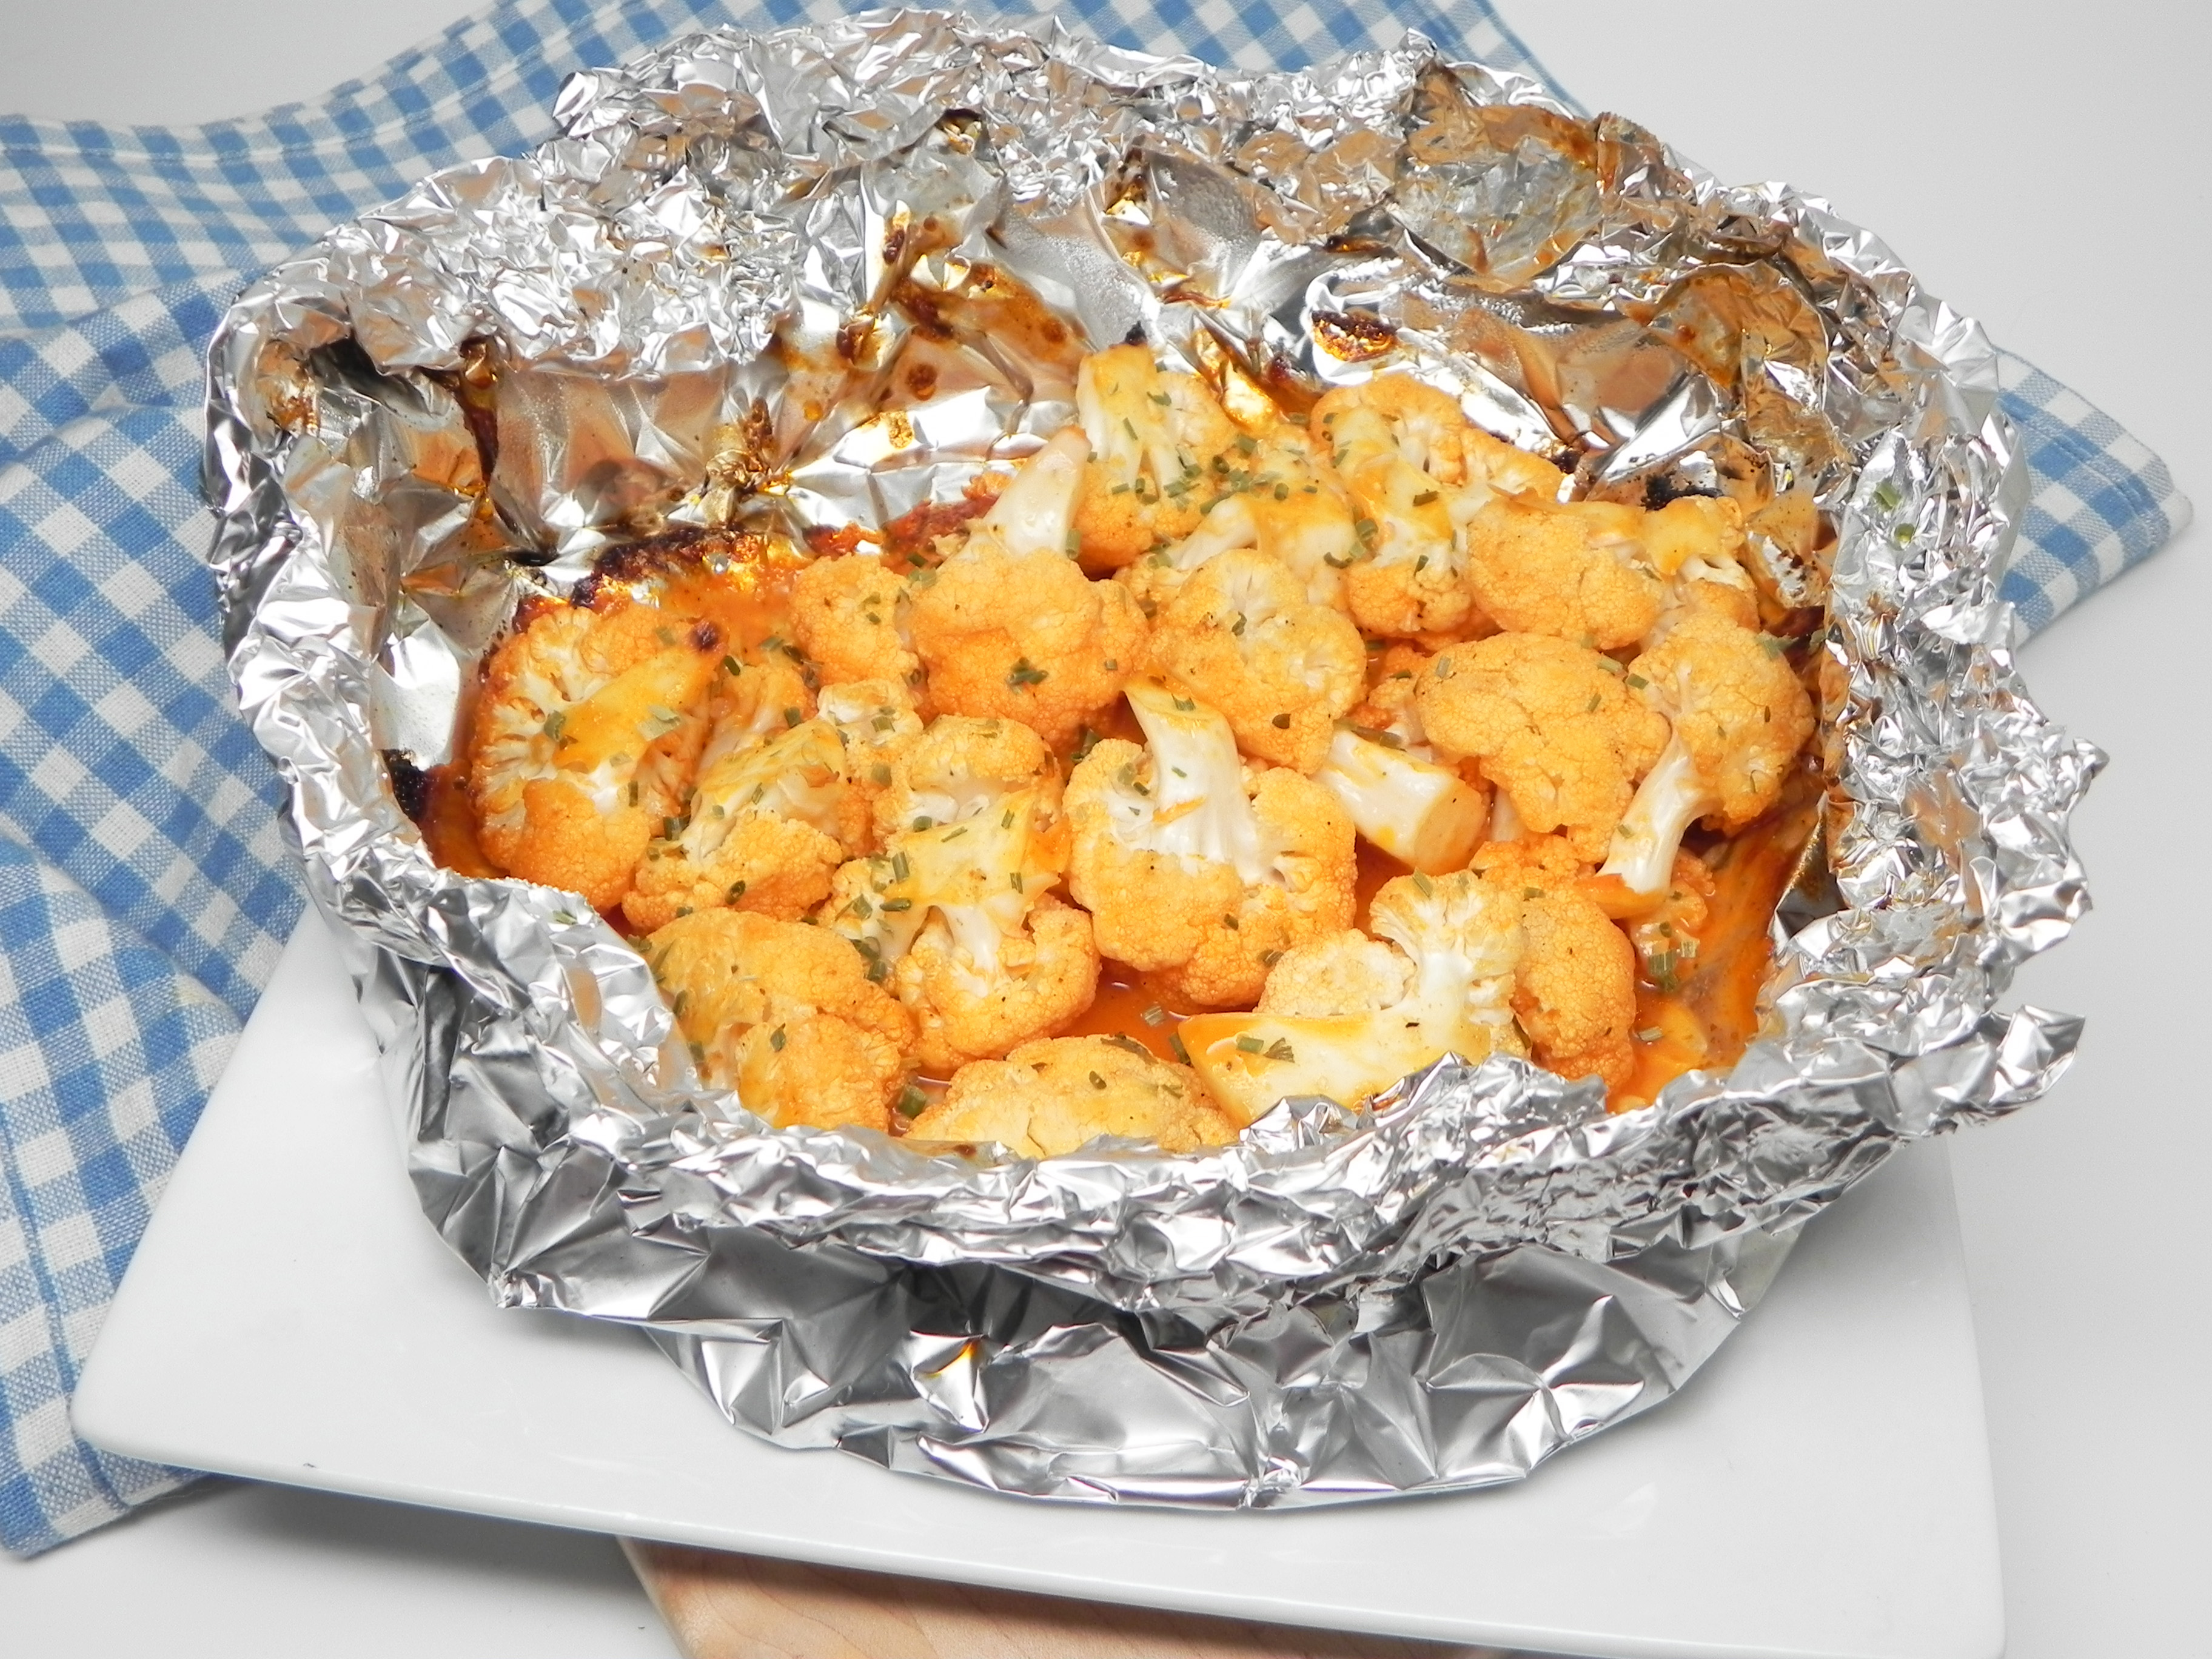 Grilled Buffalo Cauliflower in Foil